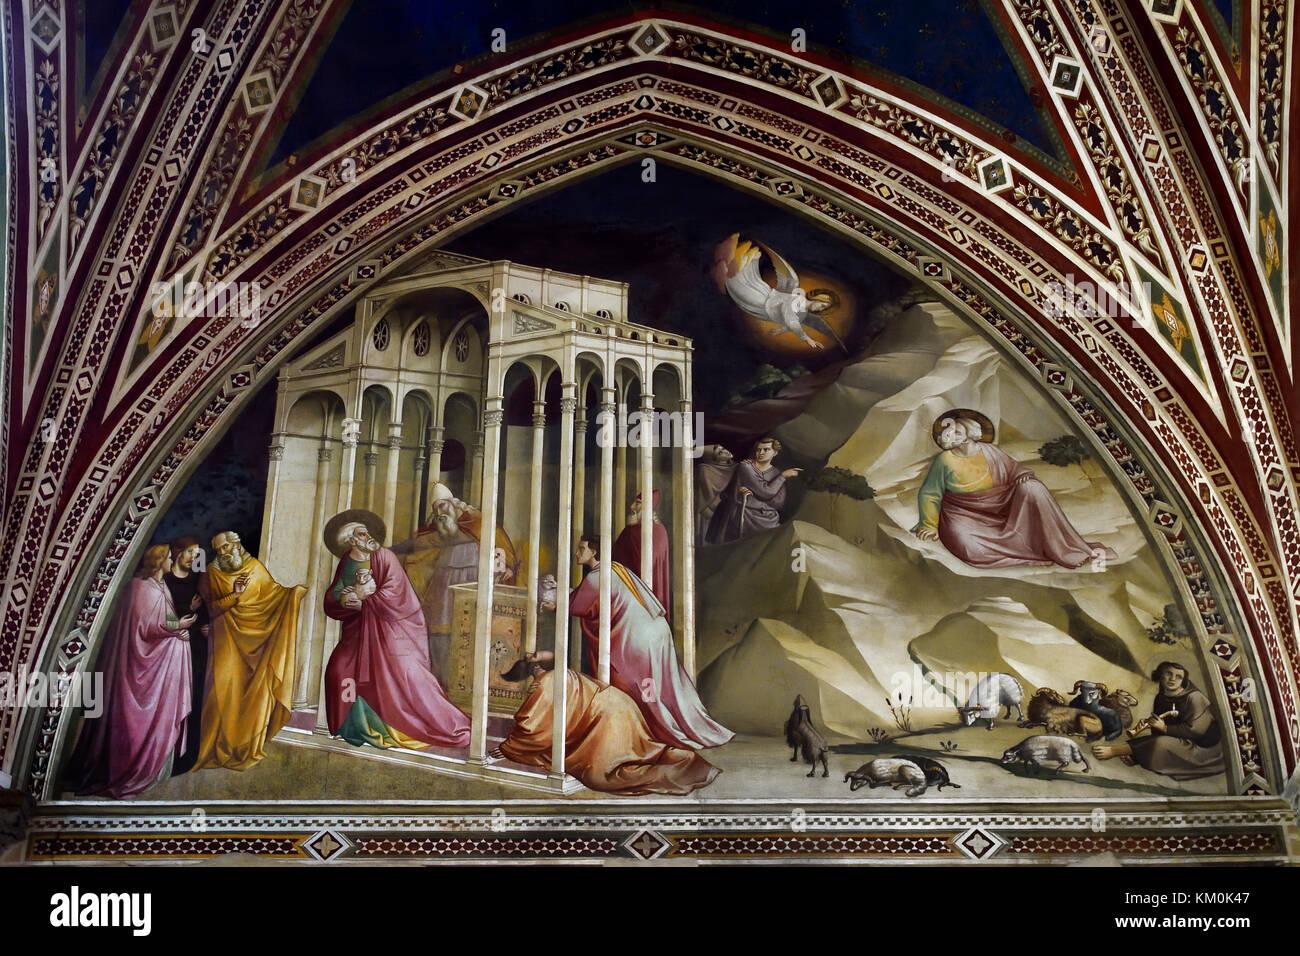 Expulsion of Joachim from the Temple c. 1330 Fresco Cappella Baroncelli, Santa Croce, Florence Museo dell'Opera - Stock Image